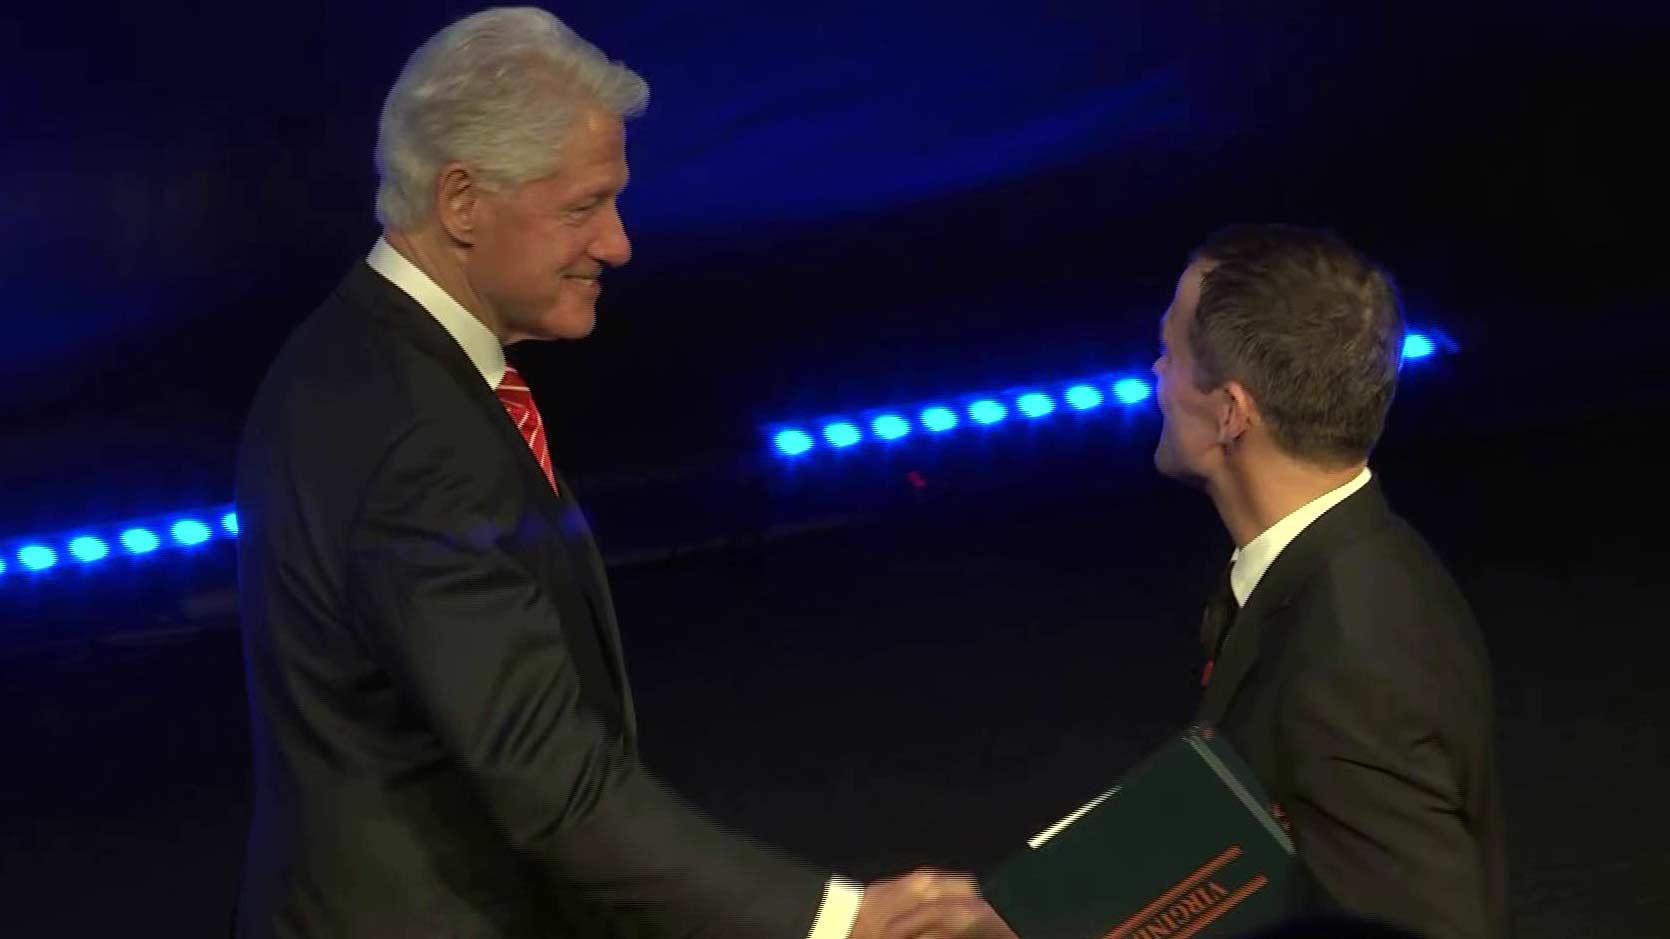 Bill Clinton Discusses Inclusion During PrezFest in Charlottesville